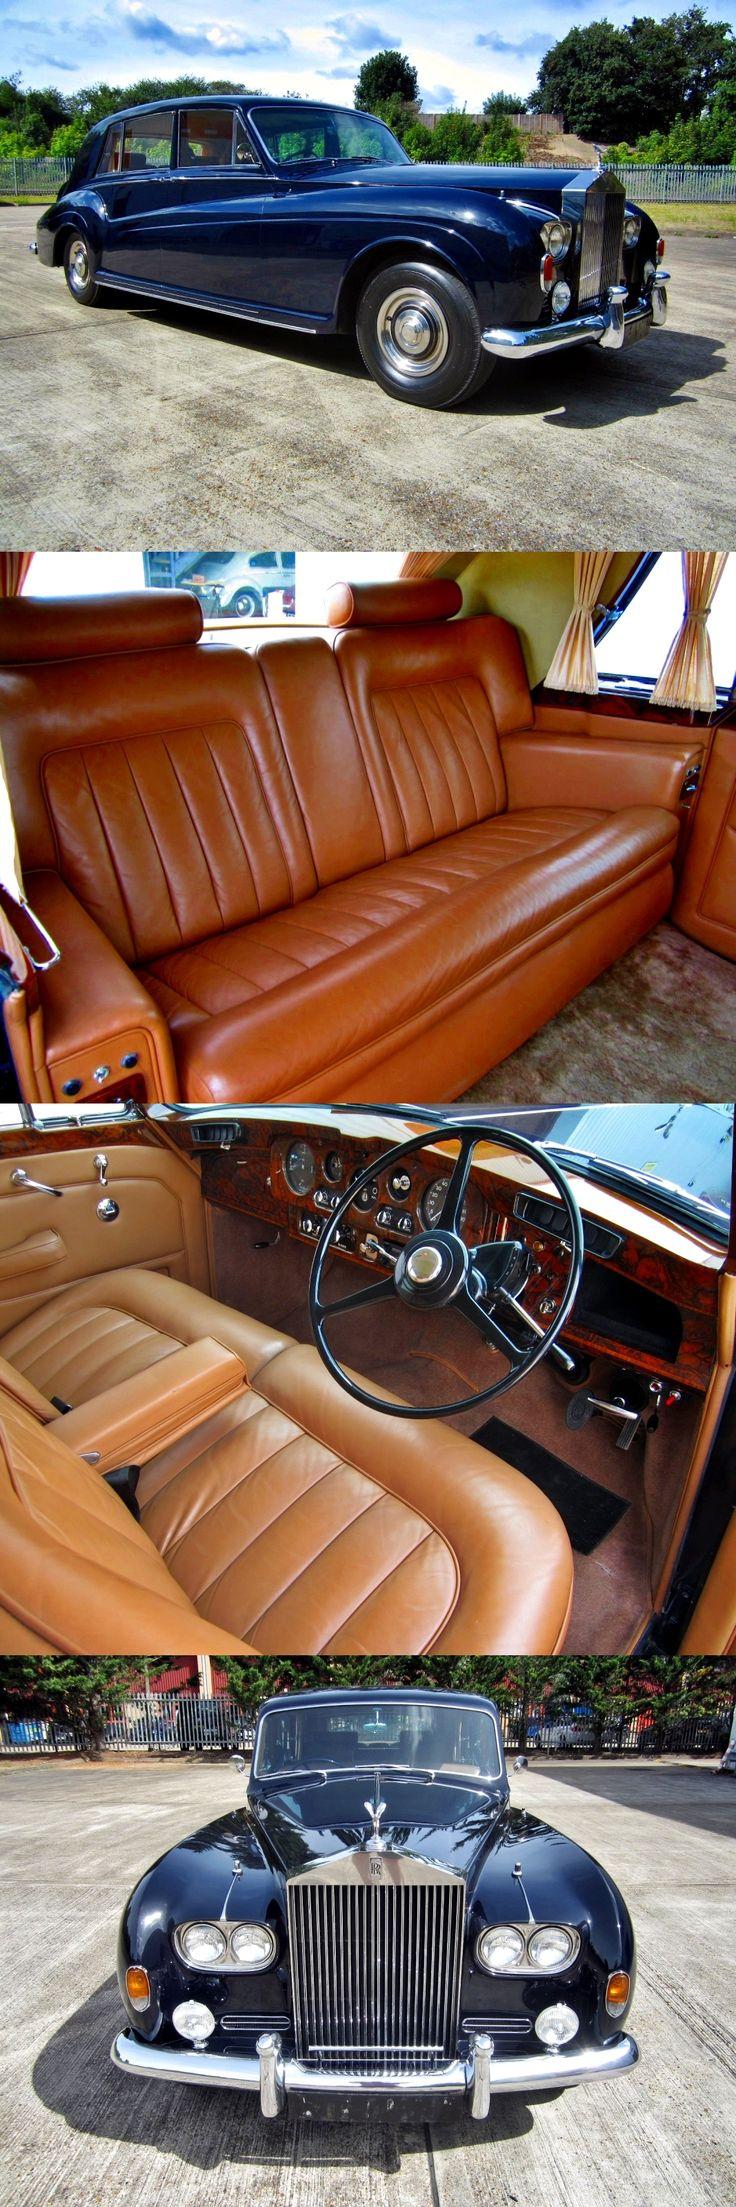 1967 Rolls-Royce Phantom V James Young PV16 design.                                                                                                                                                                                 Más